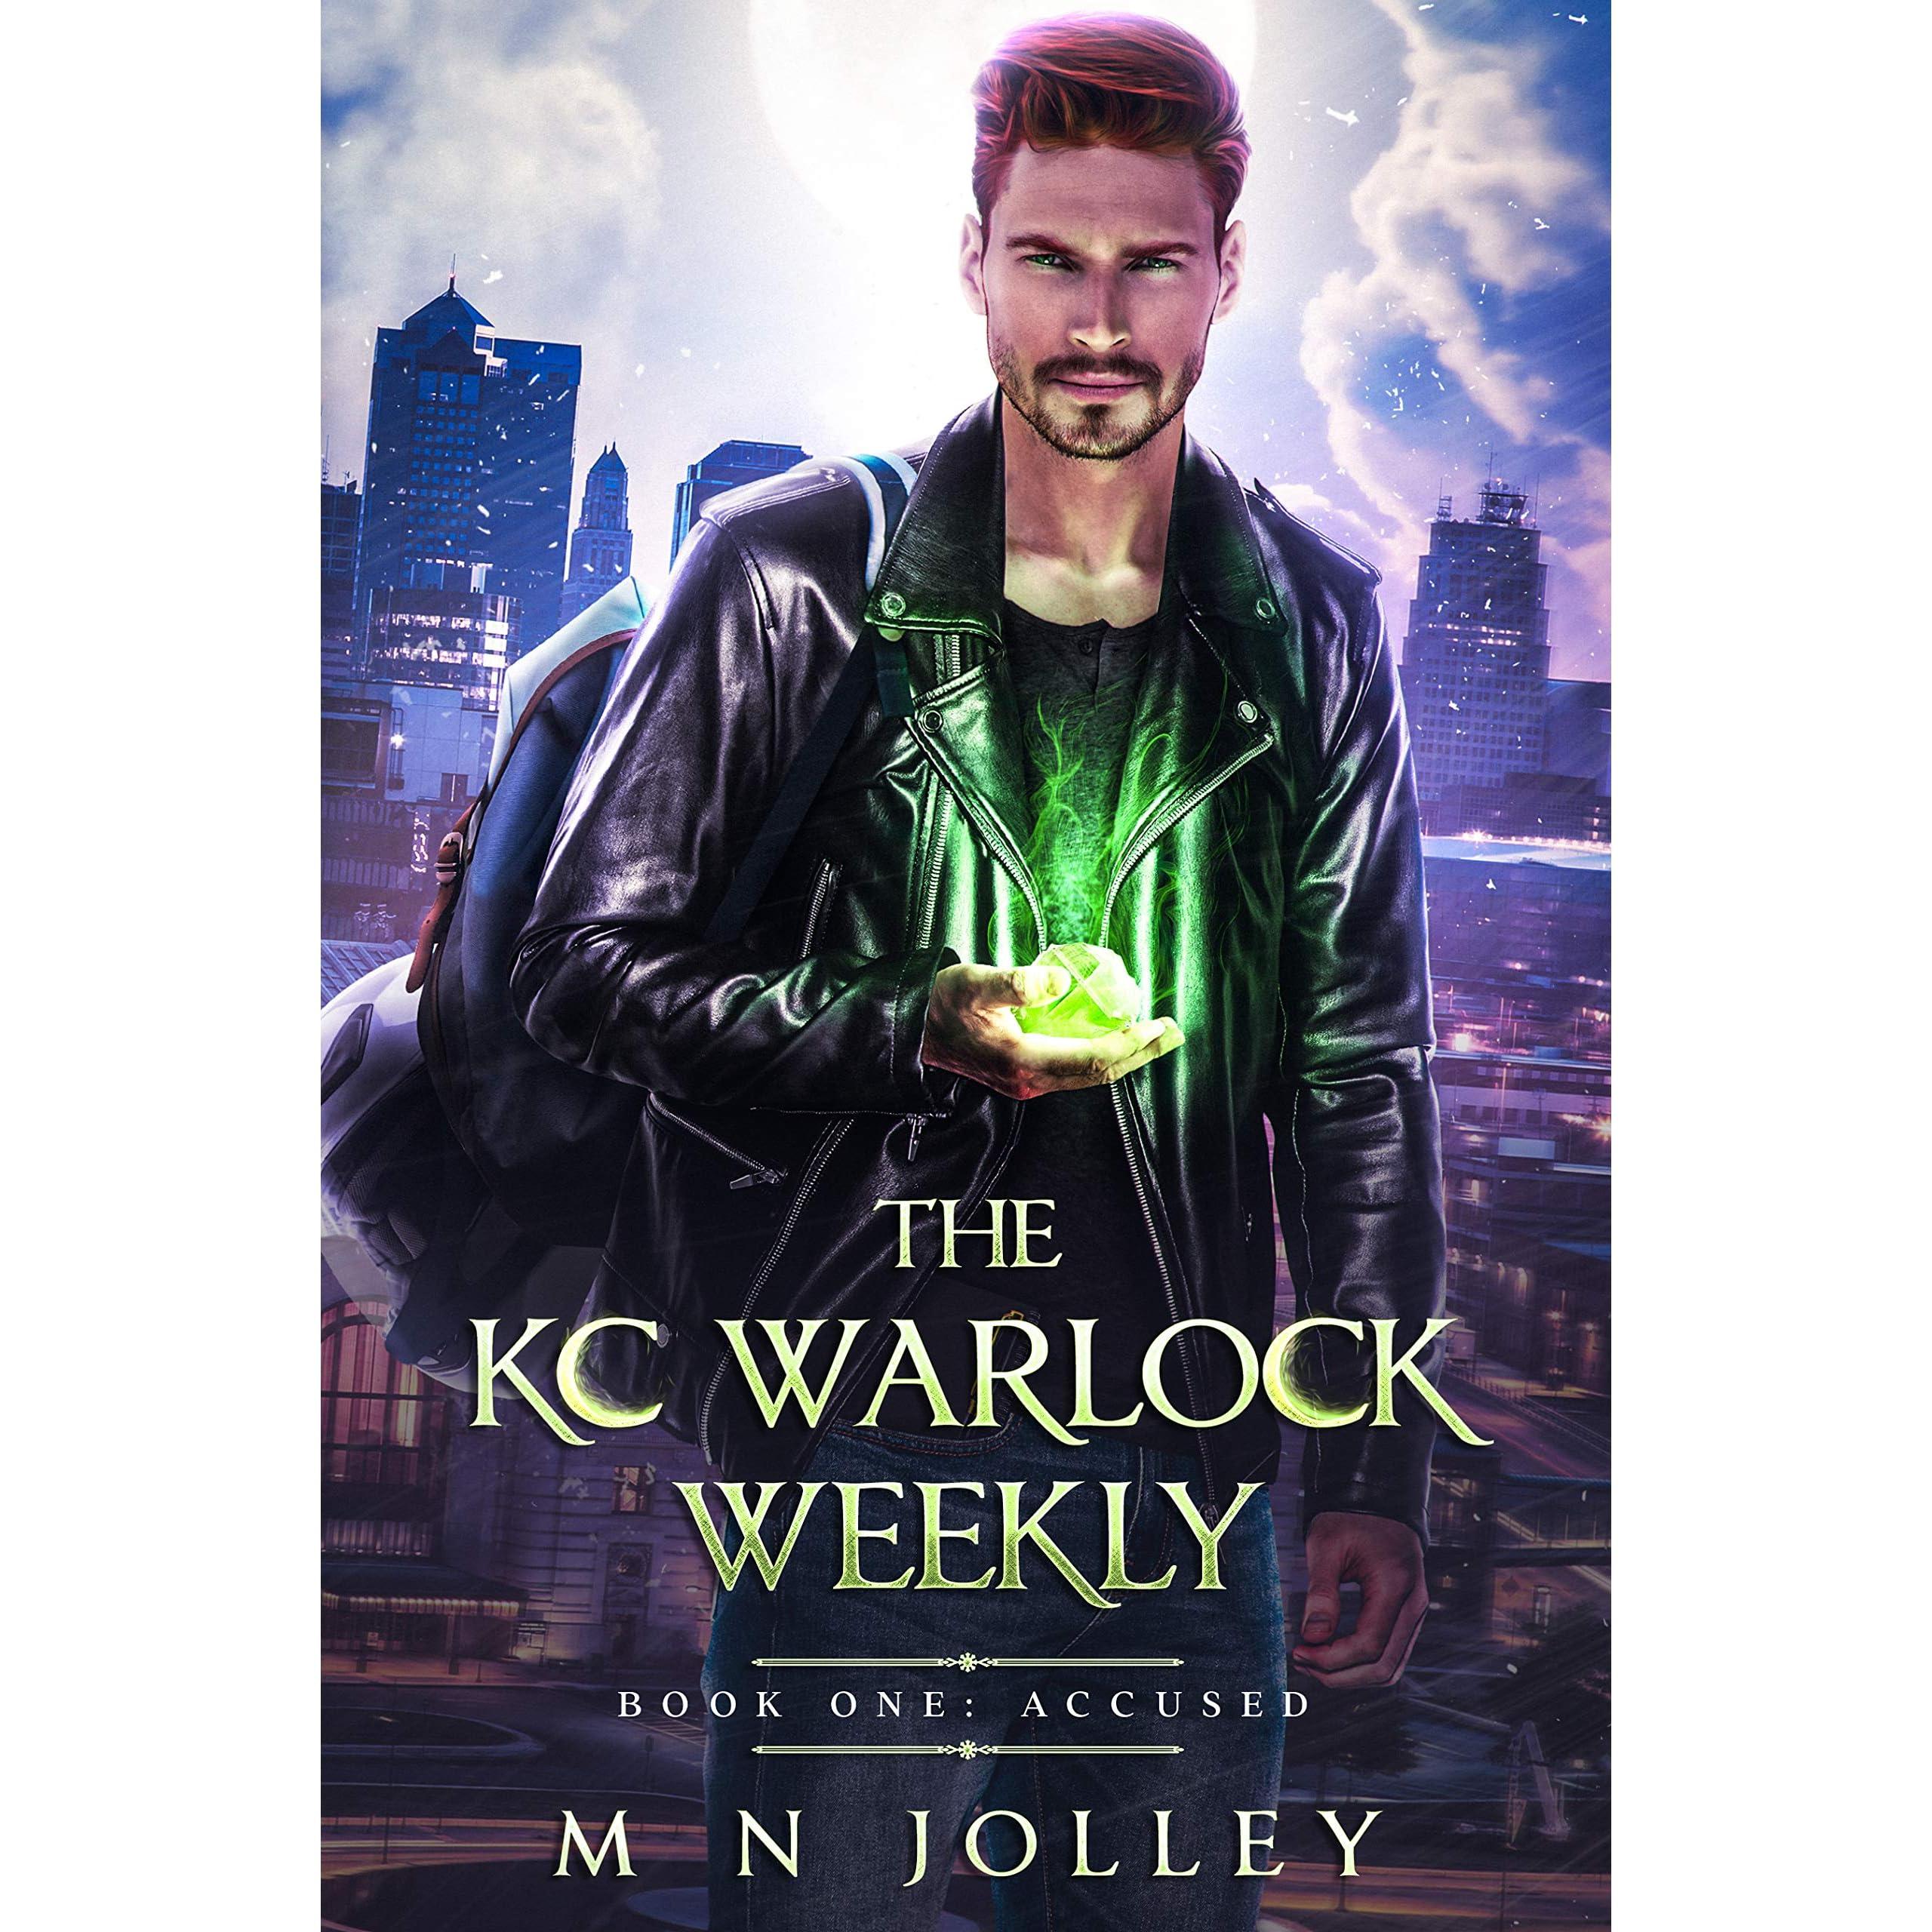 The KC Warlock Weekly: Book One: Accused by M.N. Jolley